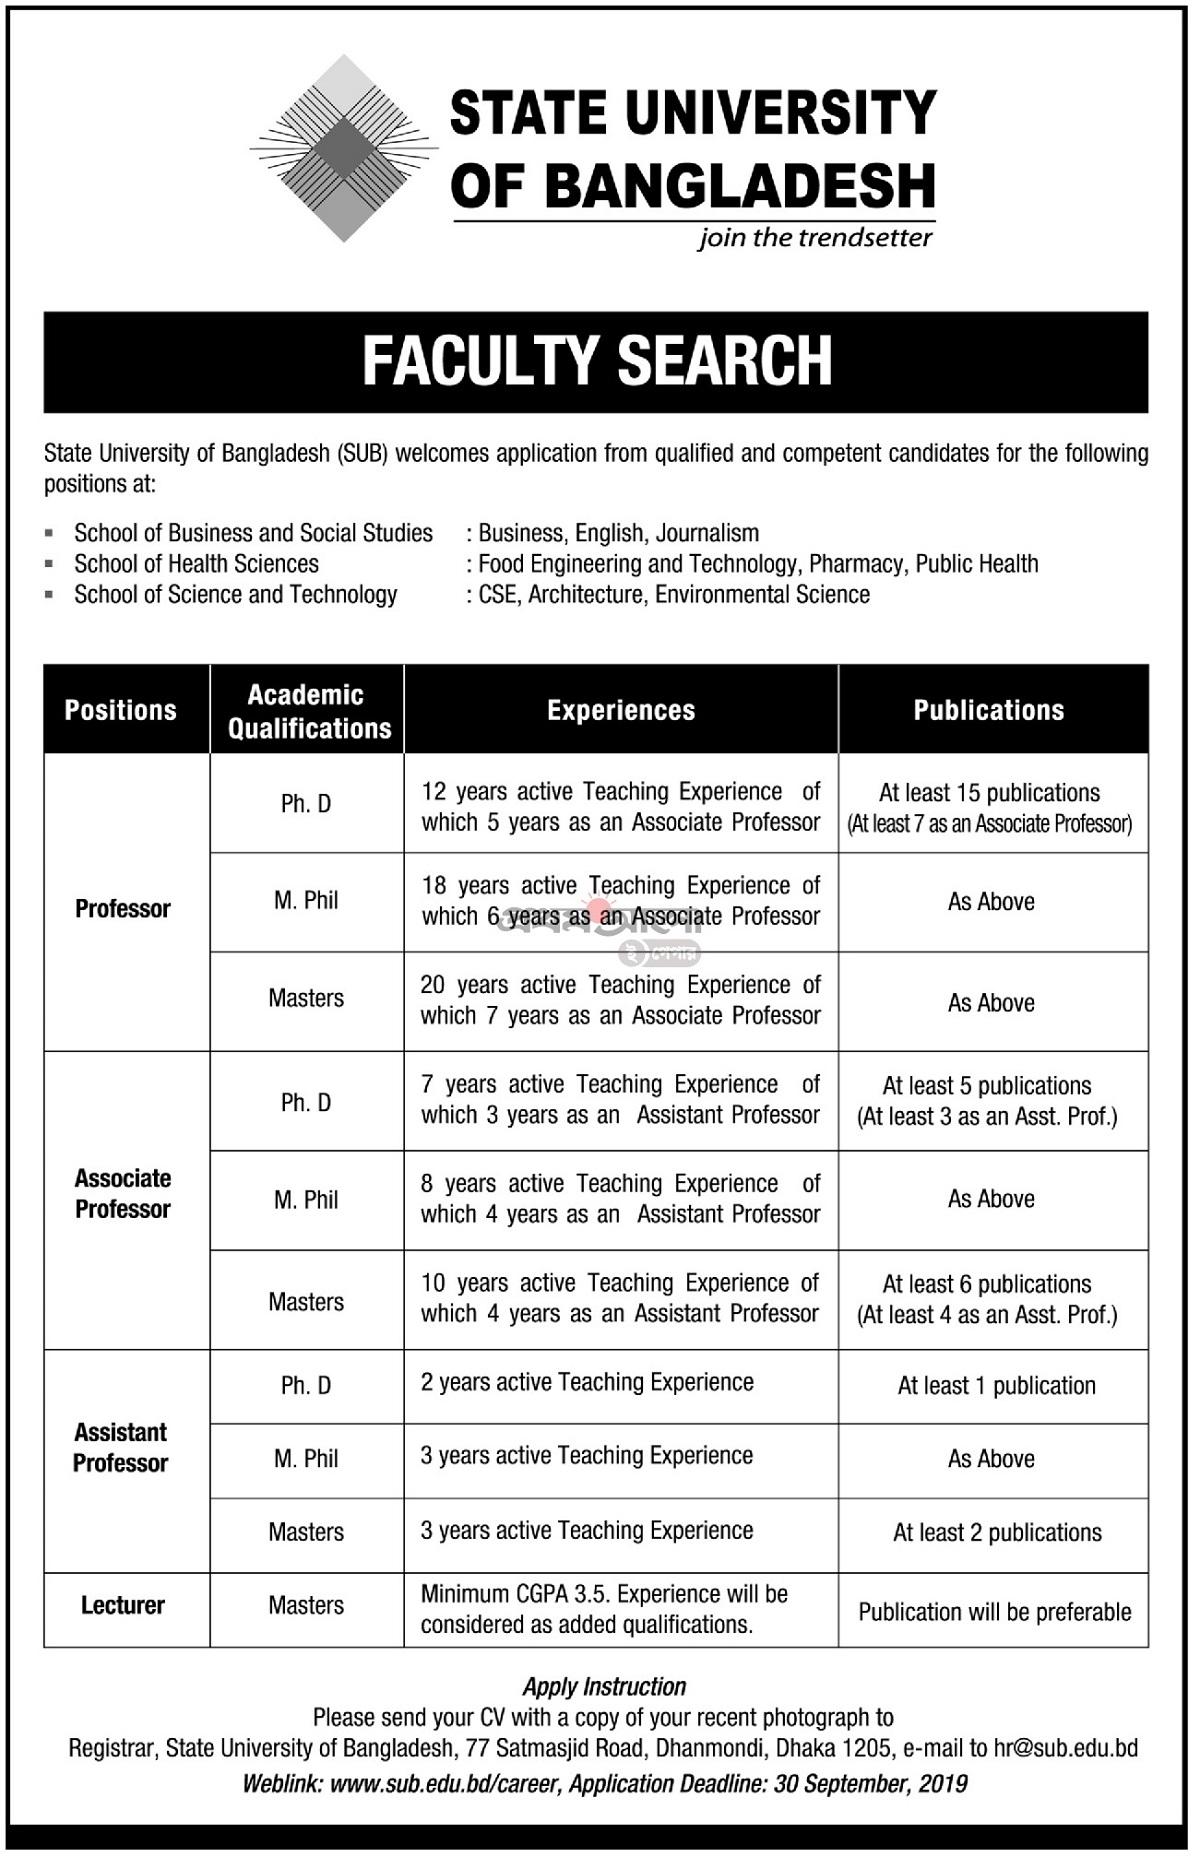 State University of Bangladesh (SUB) Job Circular 2019